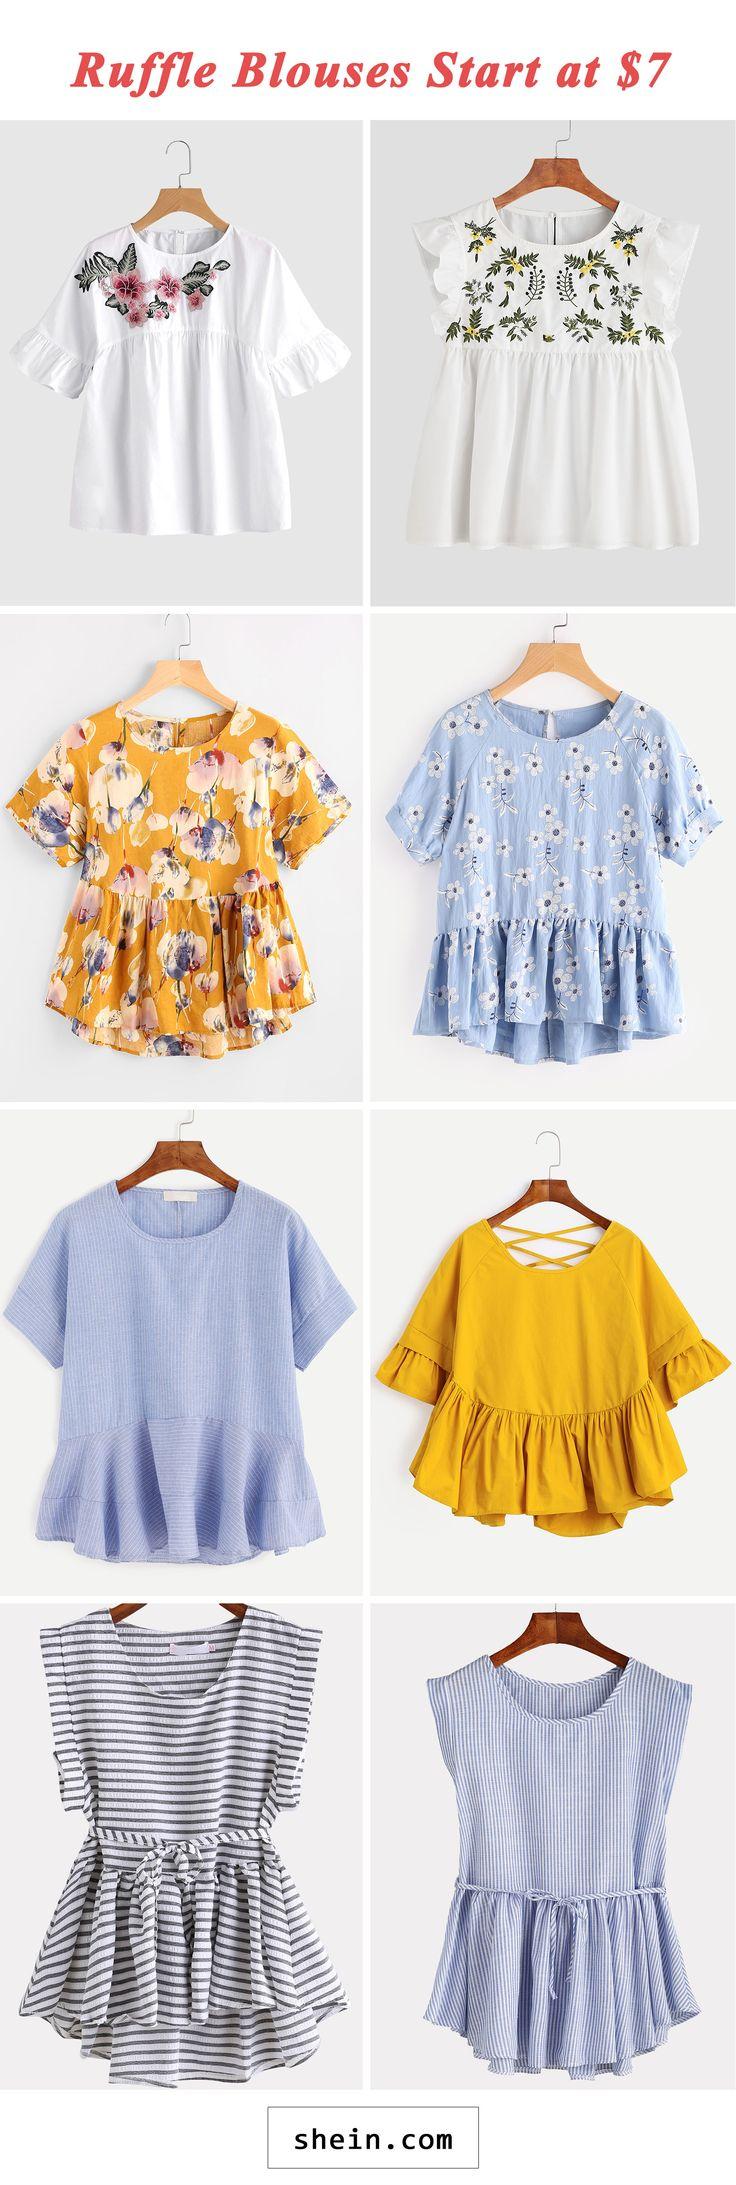 Ruffle blouses start at $7!